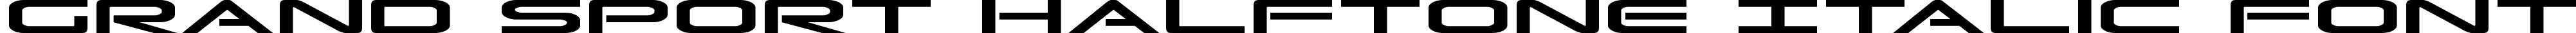 Grand Sport Halftone Italic Font